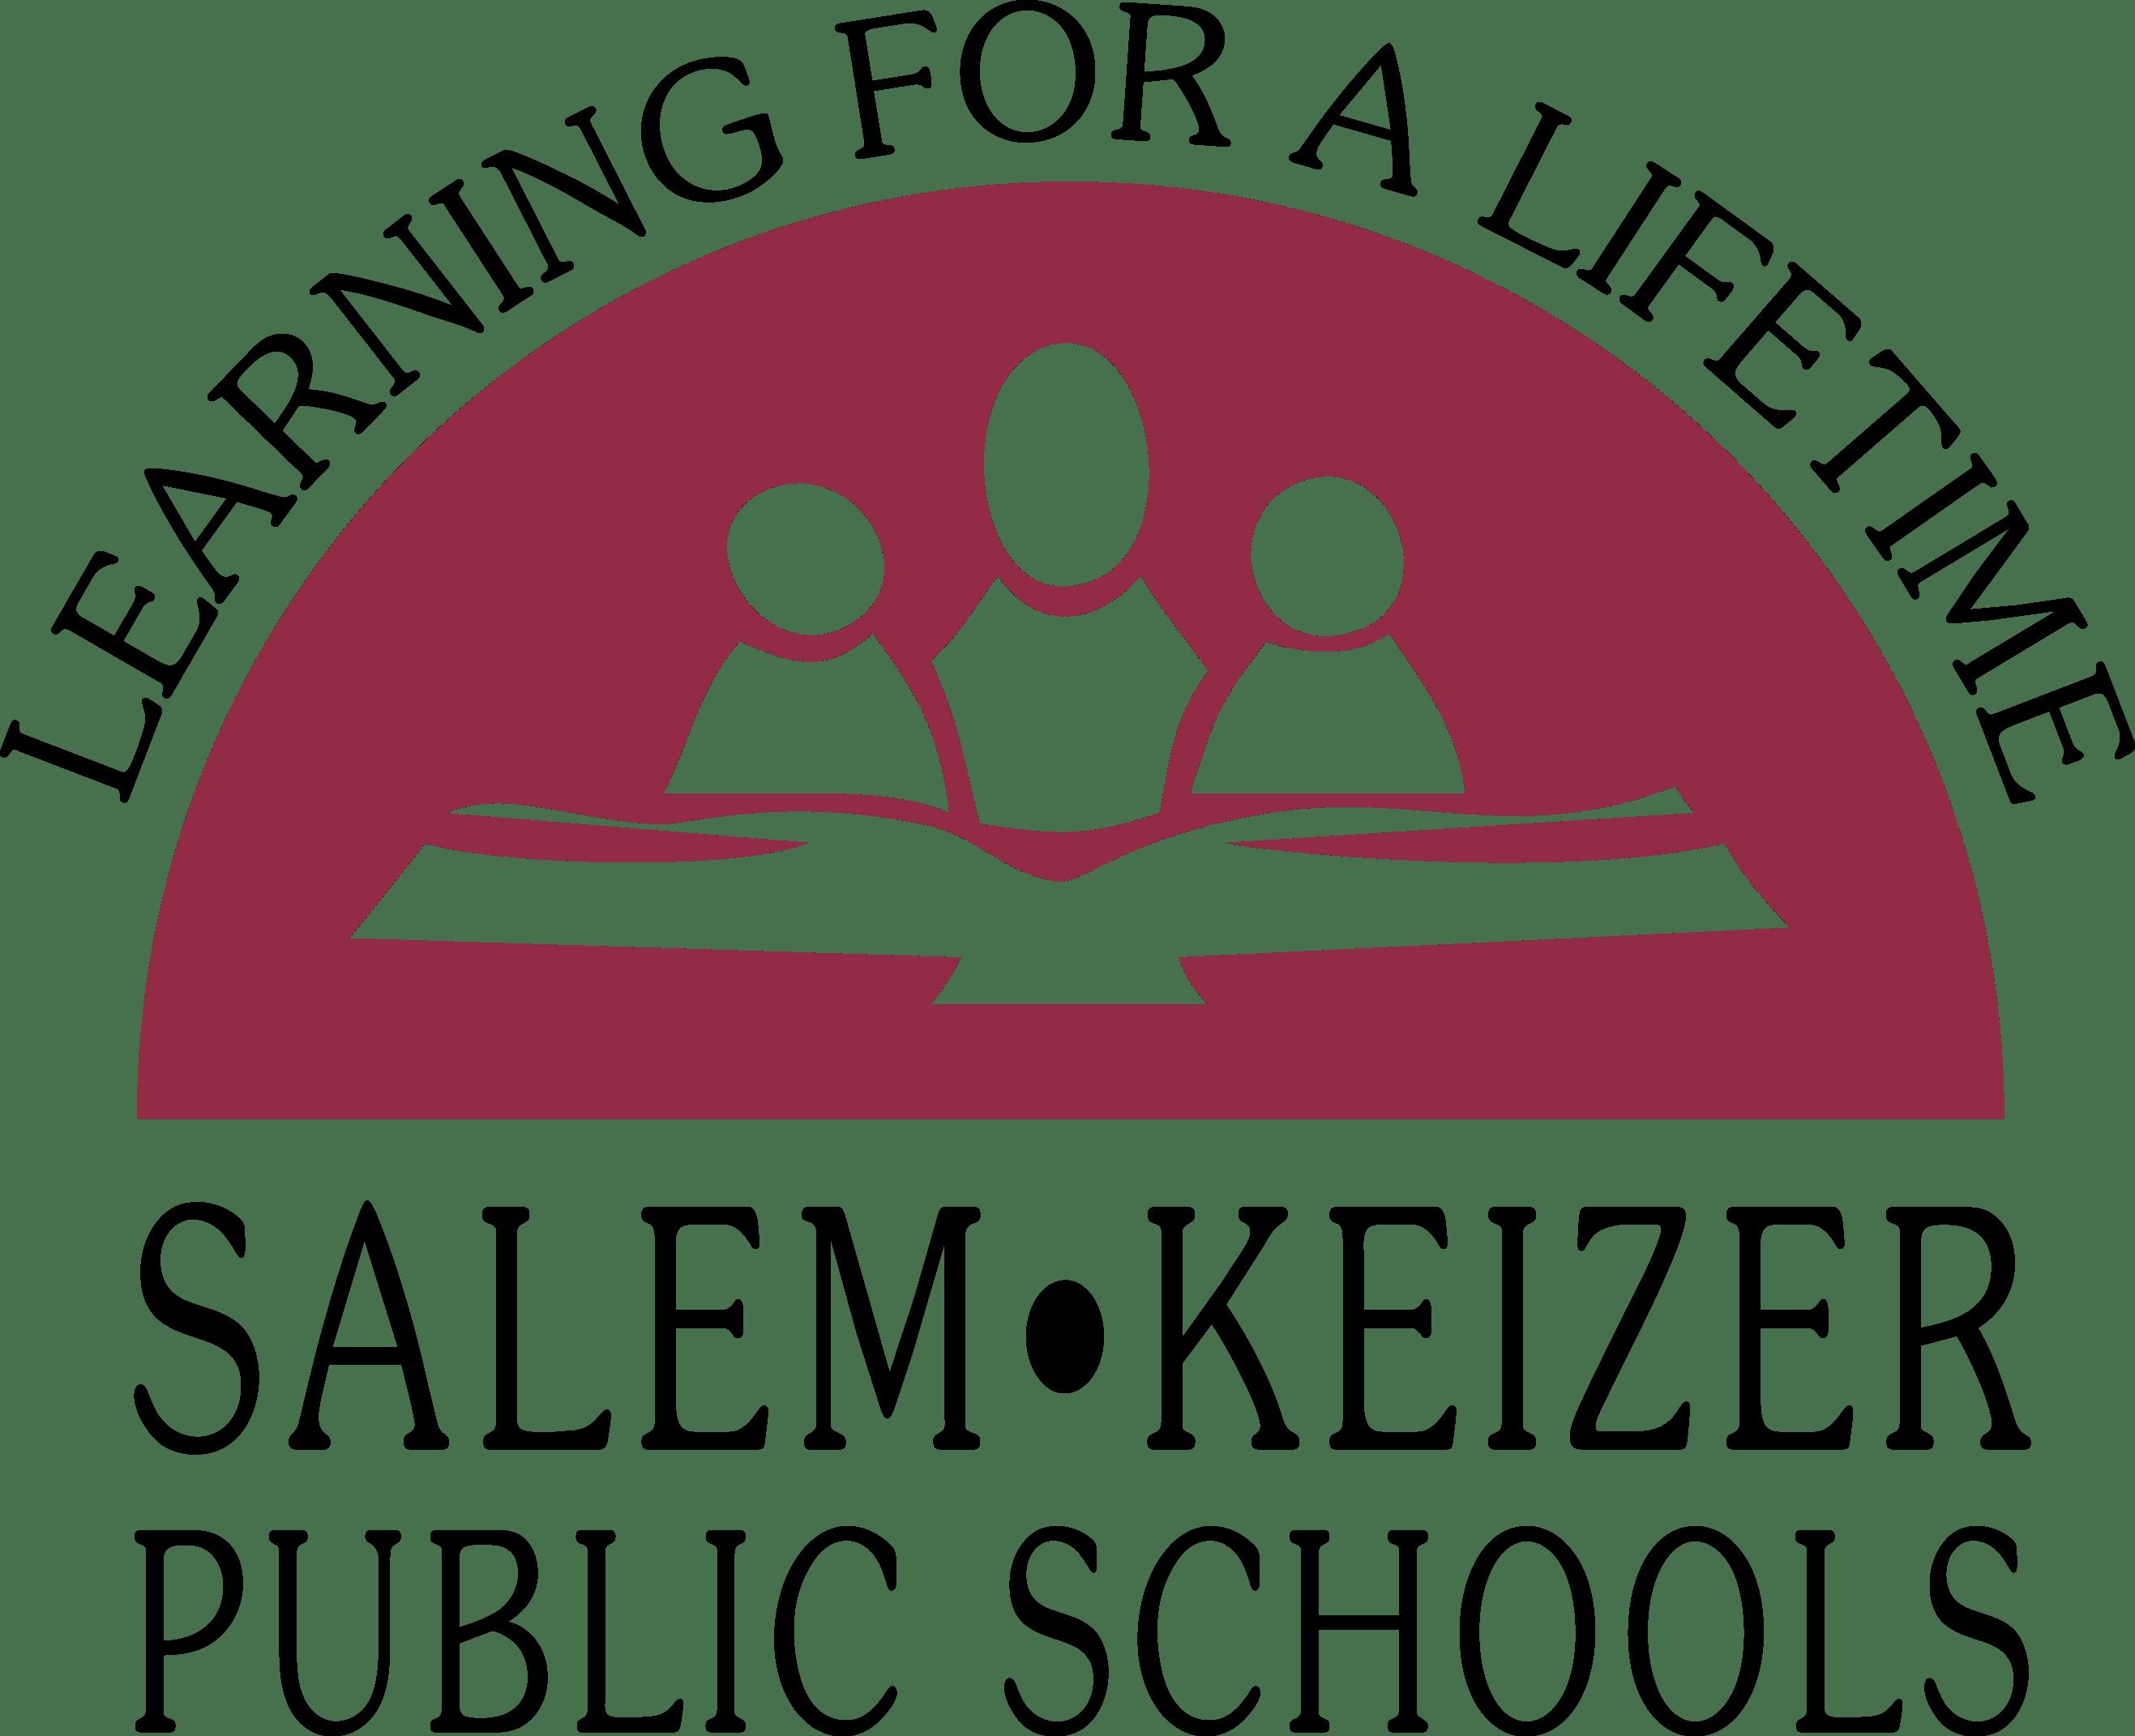 salem-keizer-logo